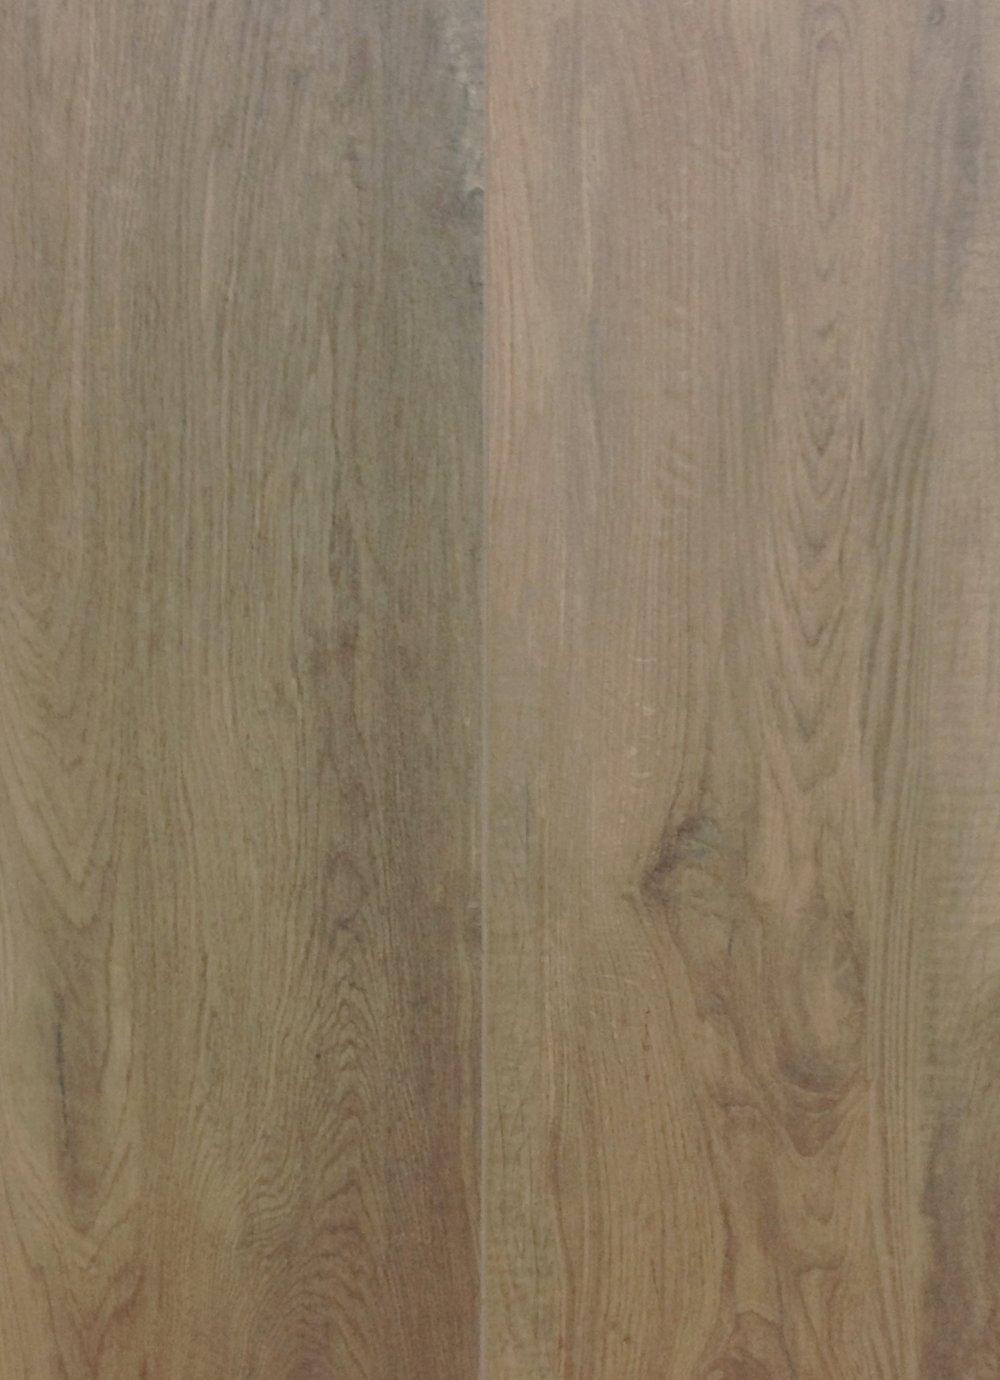 Wooden Marron